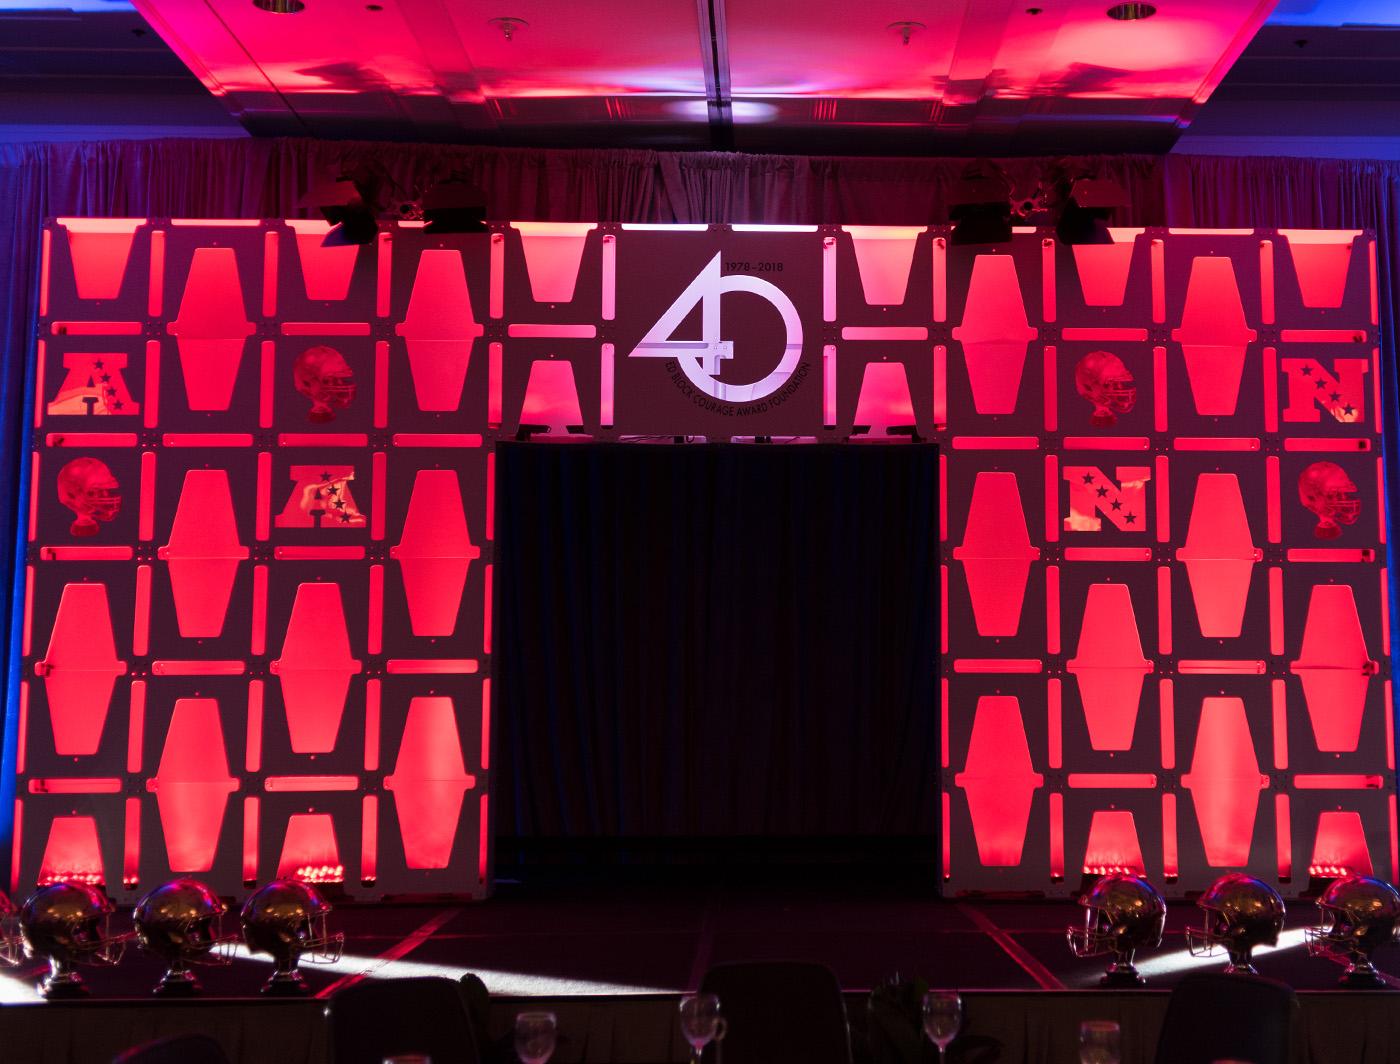 un-panel custom Superarch at the ed block awards